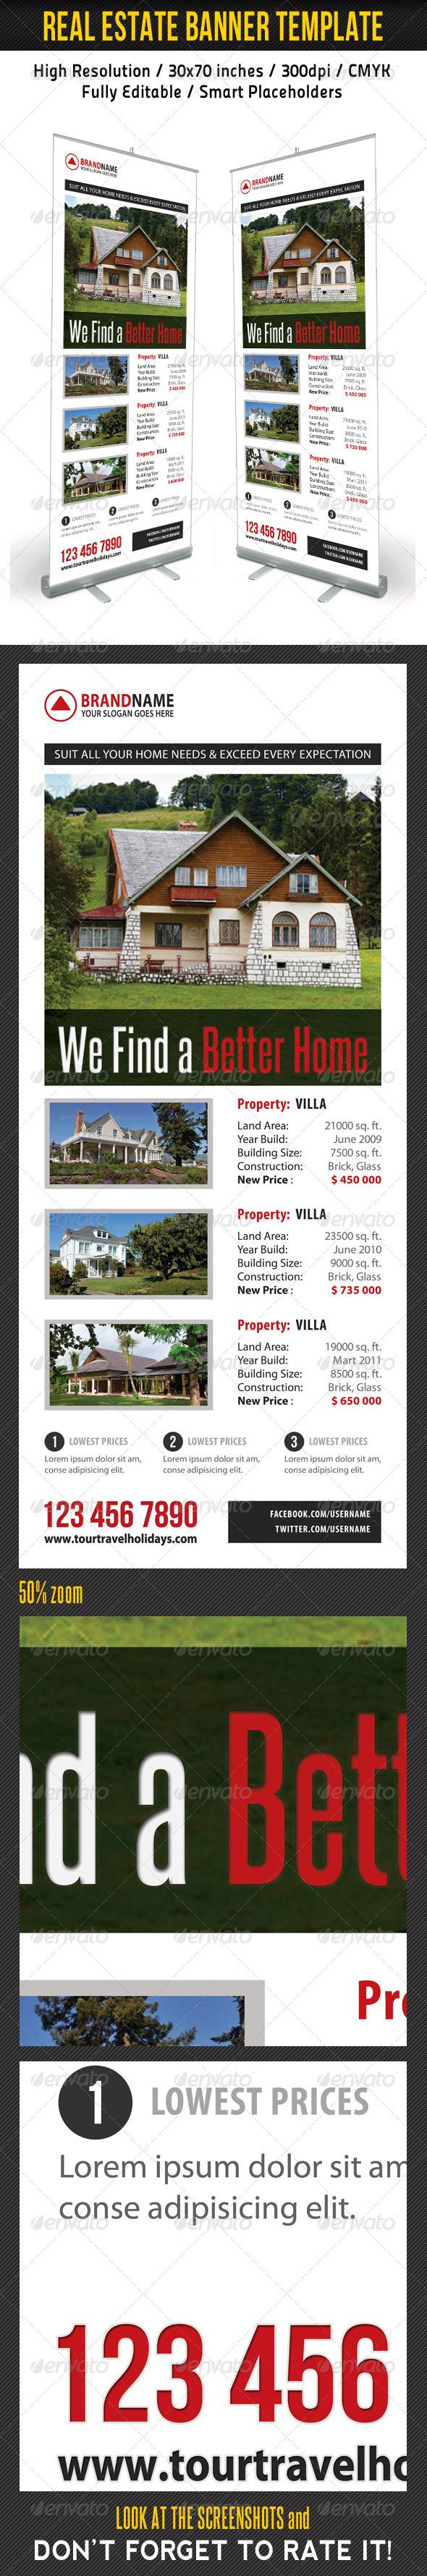 GraphicRiver Real Estate Banner Template 05 7279856